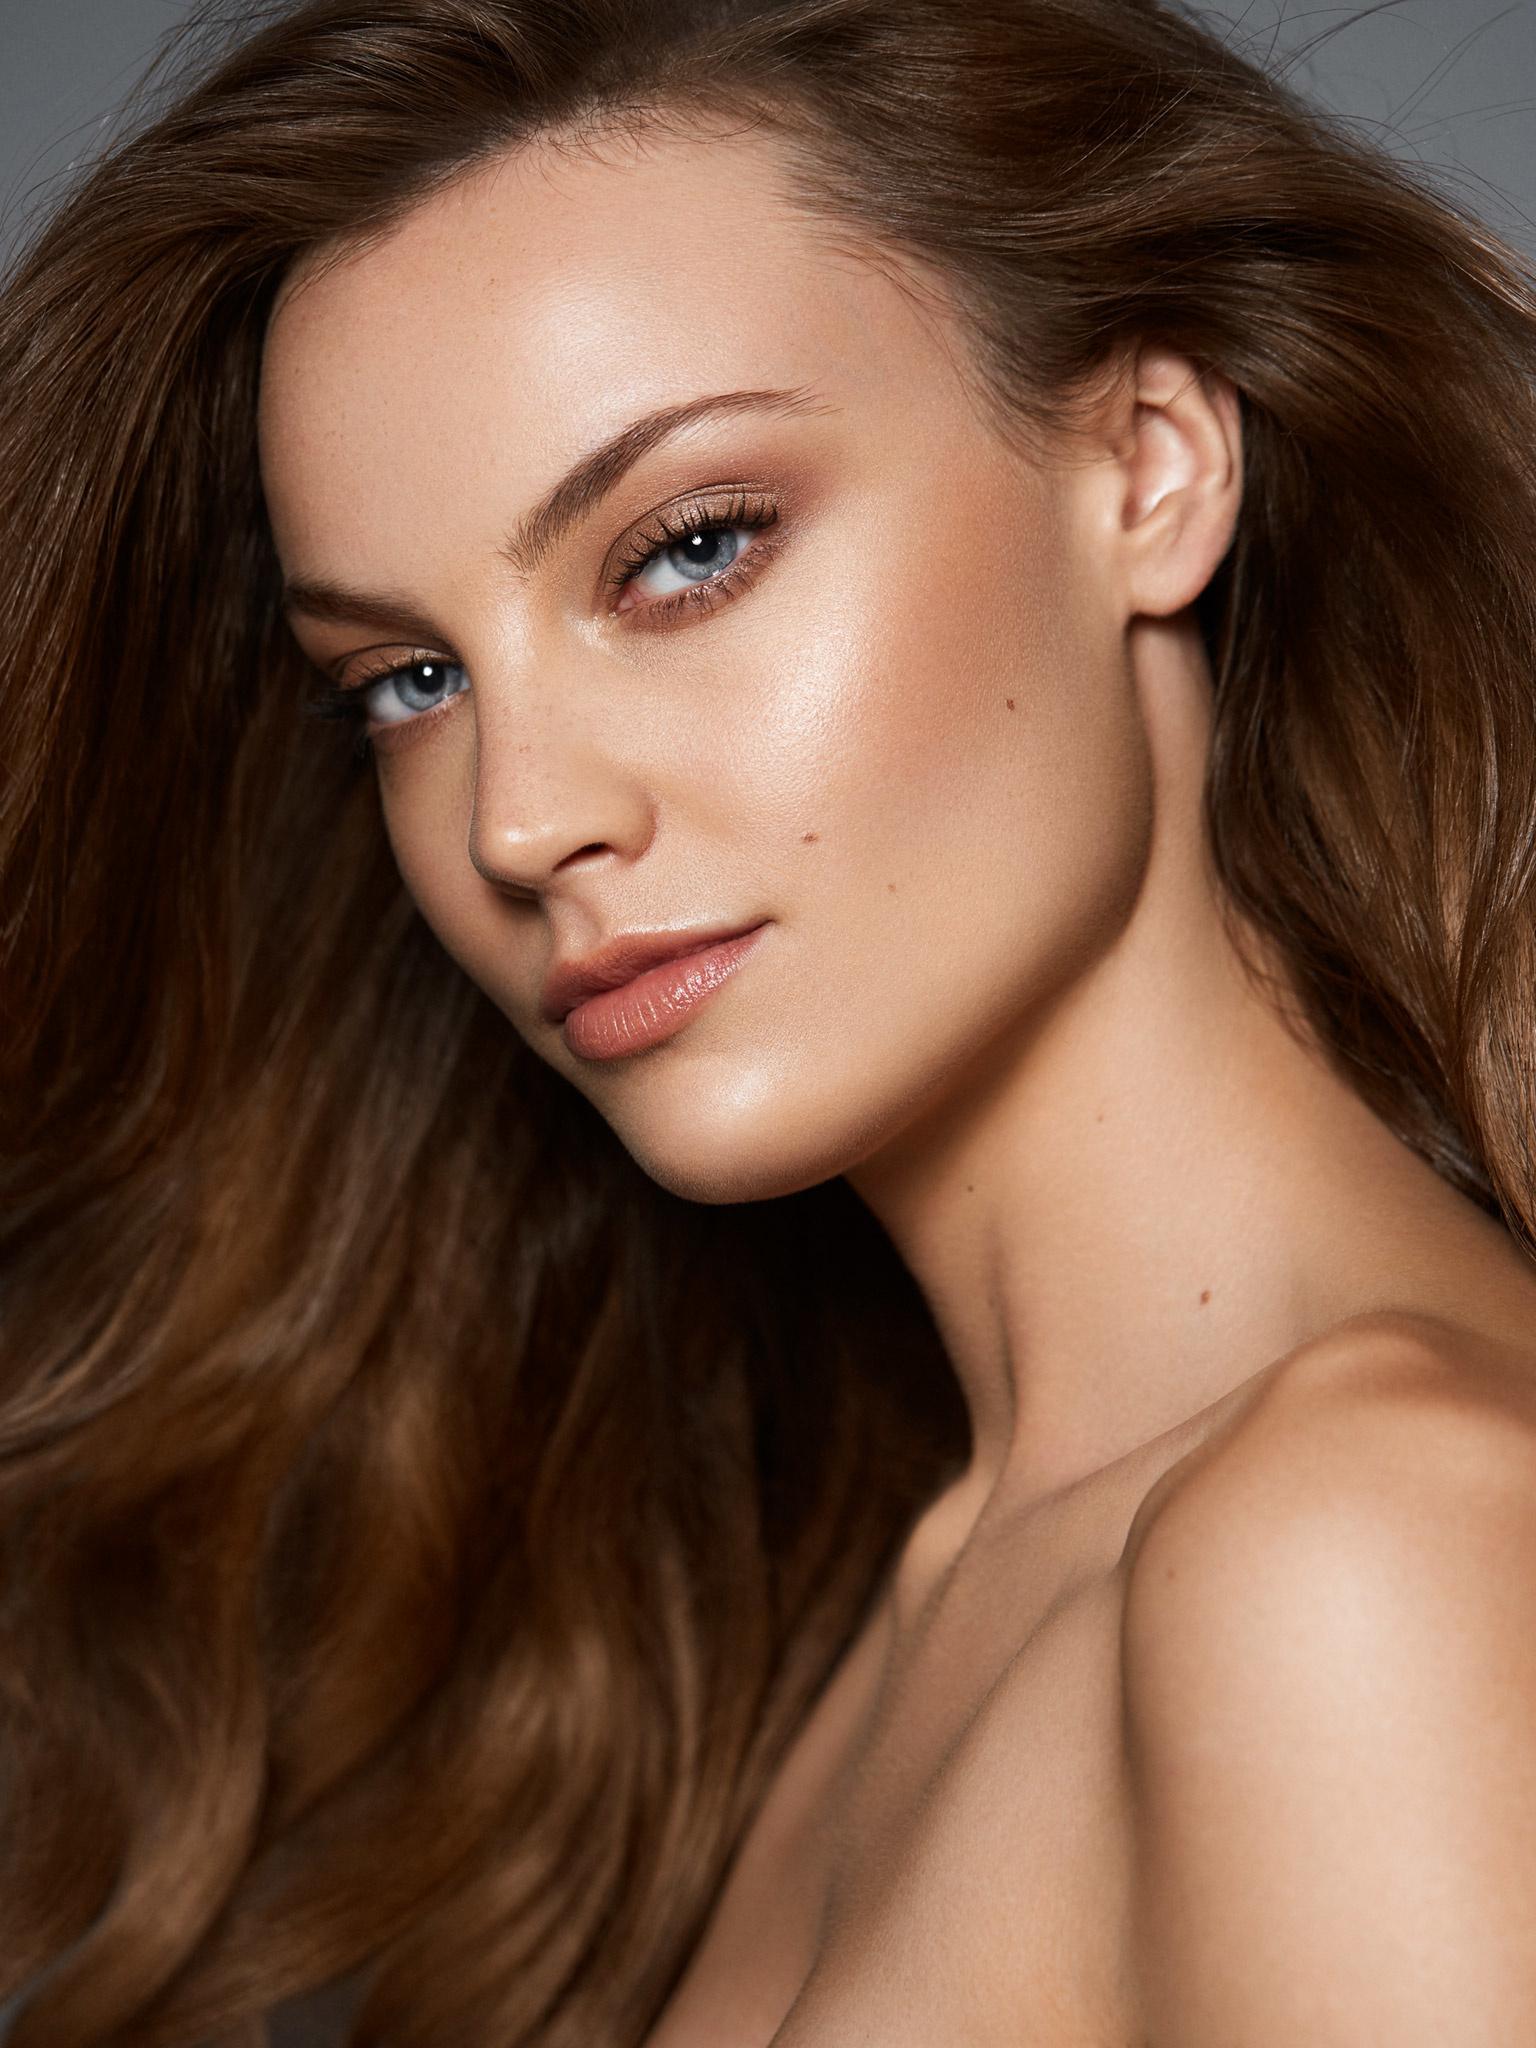 Samie-Robinson-Wilhelmina02568_retouched_2048.jpg